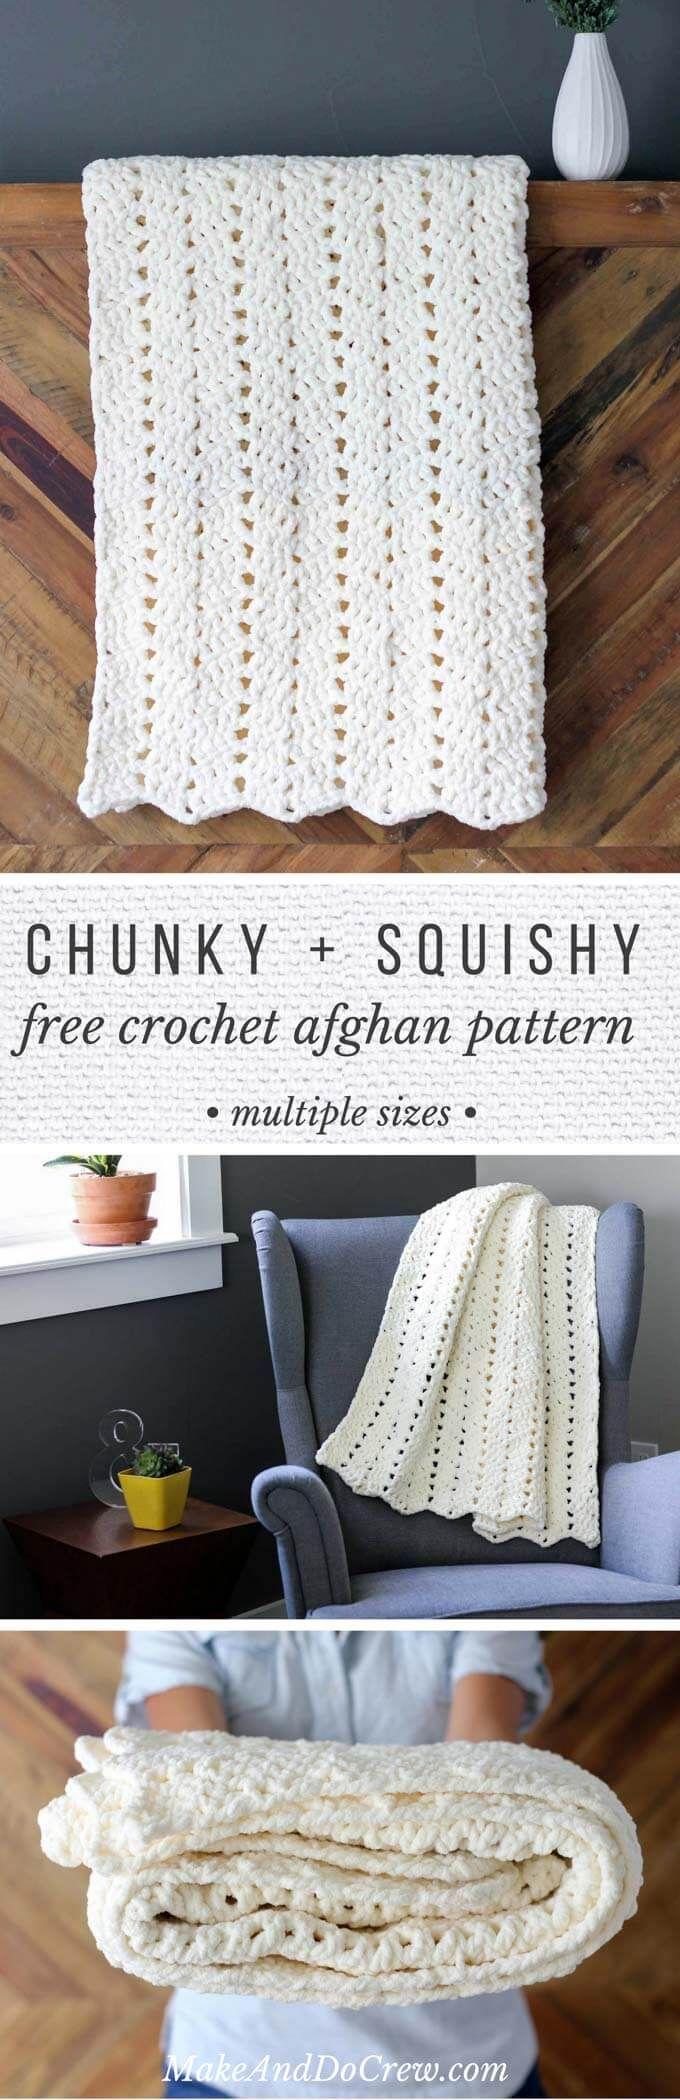 Free Modern + Chunky Crochet Blanket Pattern  Beginnerfriendly